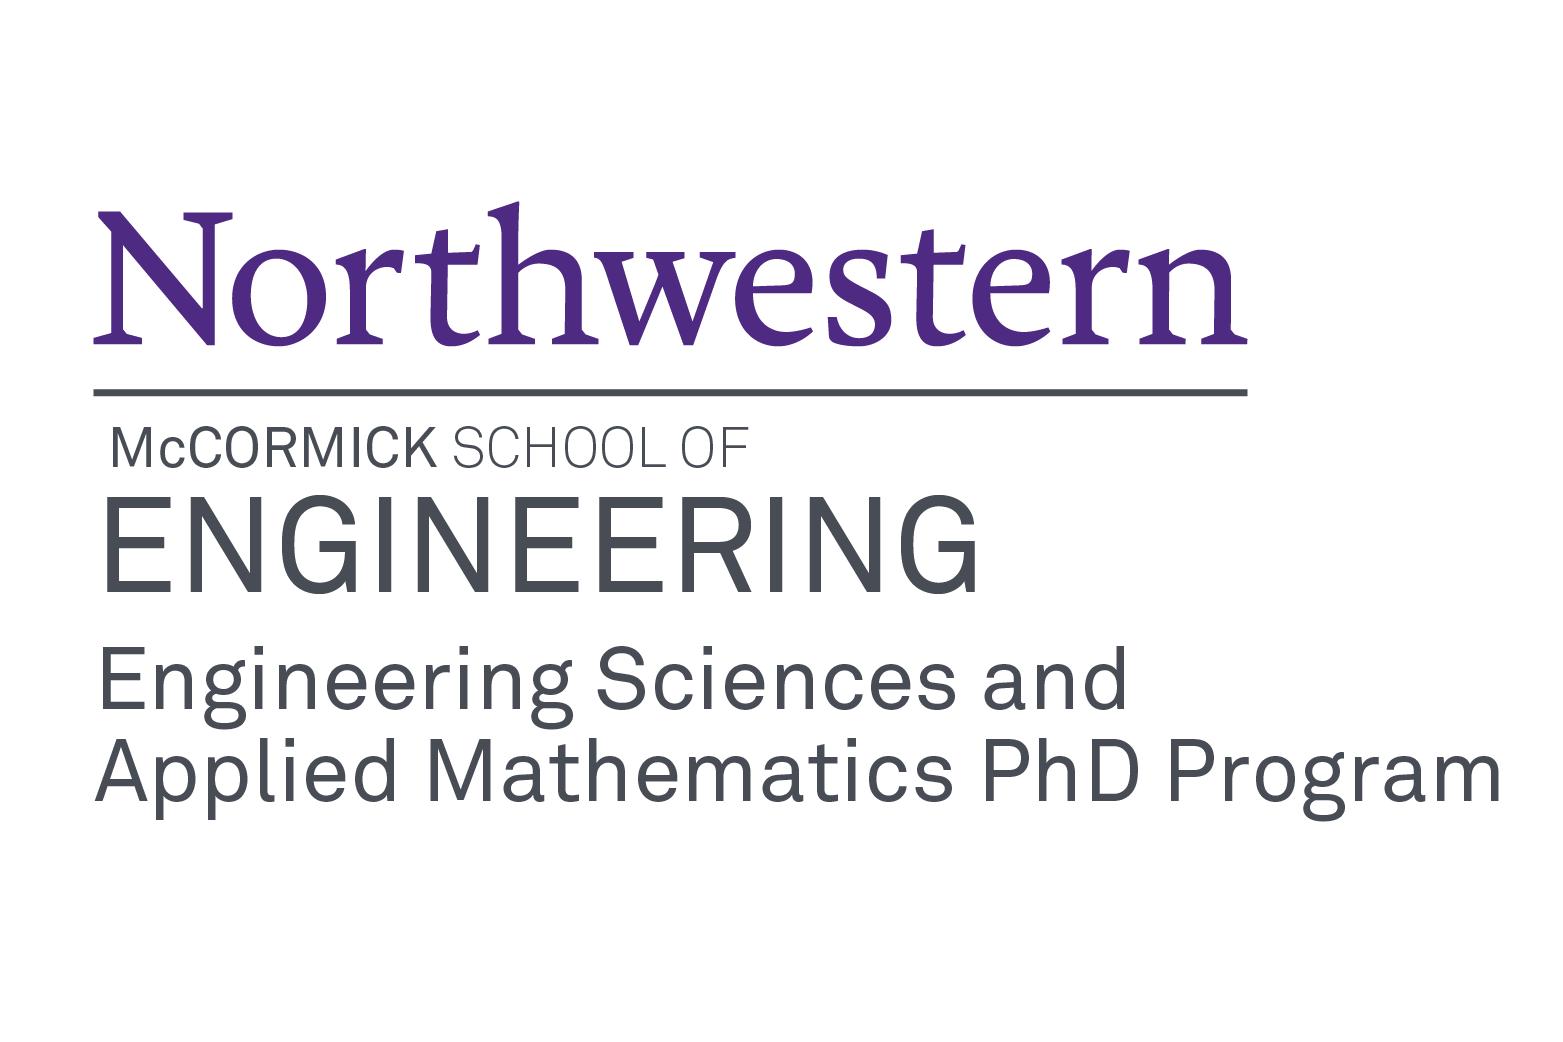 Applied Mathematics Program (Ph.D.)